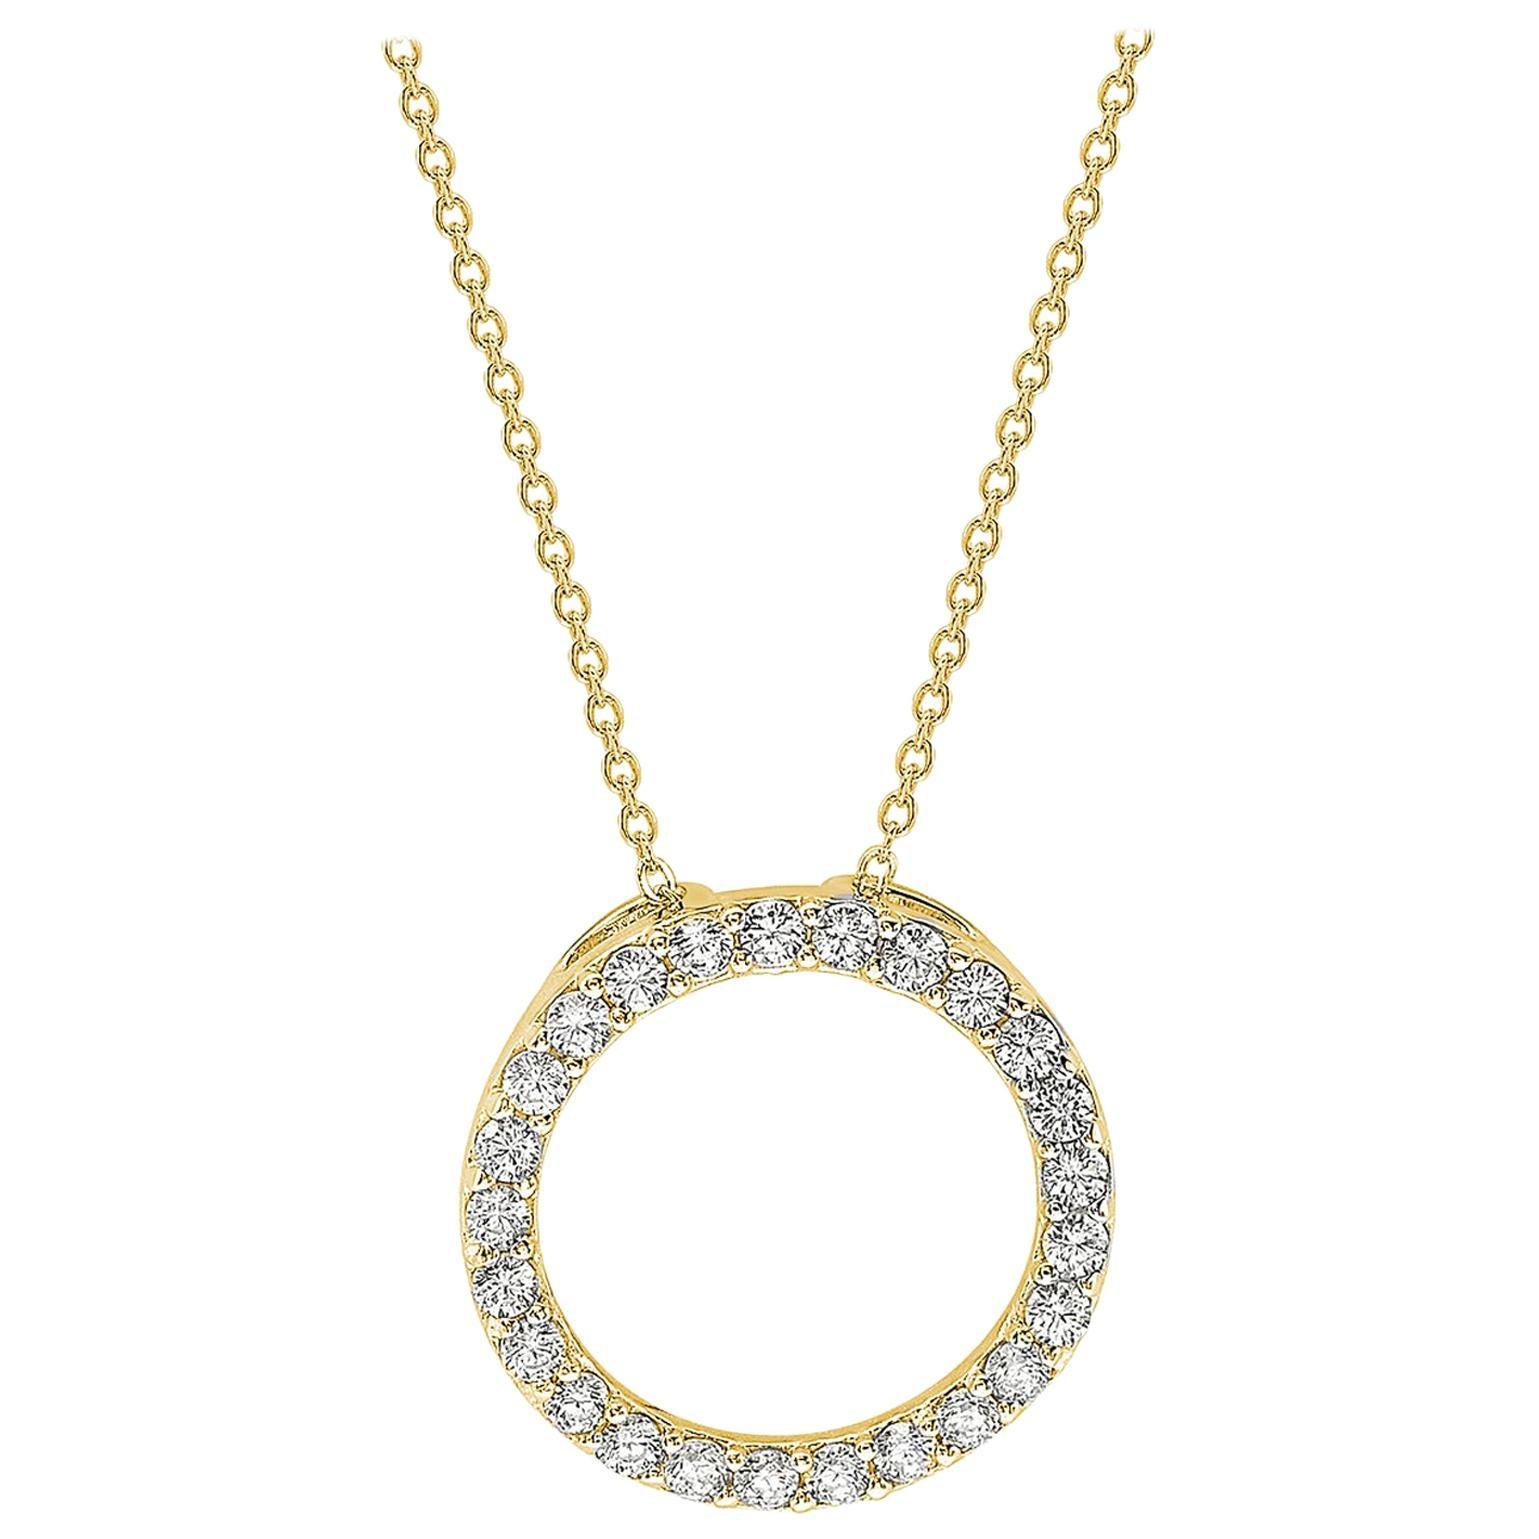 Suzy Levian 14K Yellow Gold White Diamond Circle Pendant